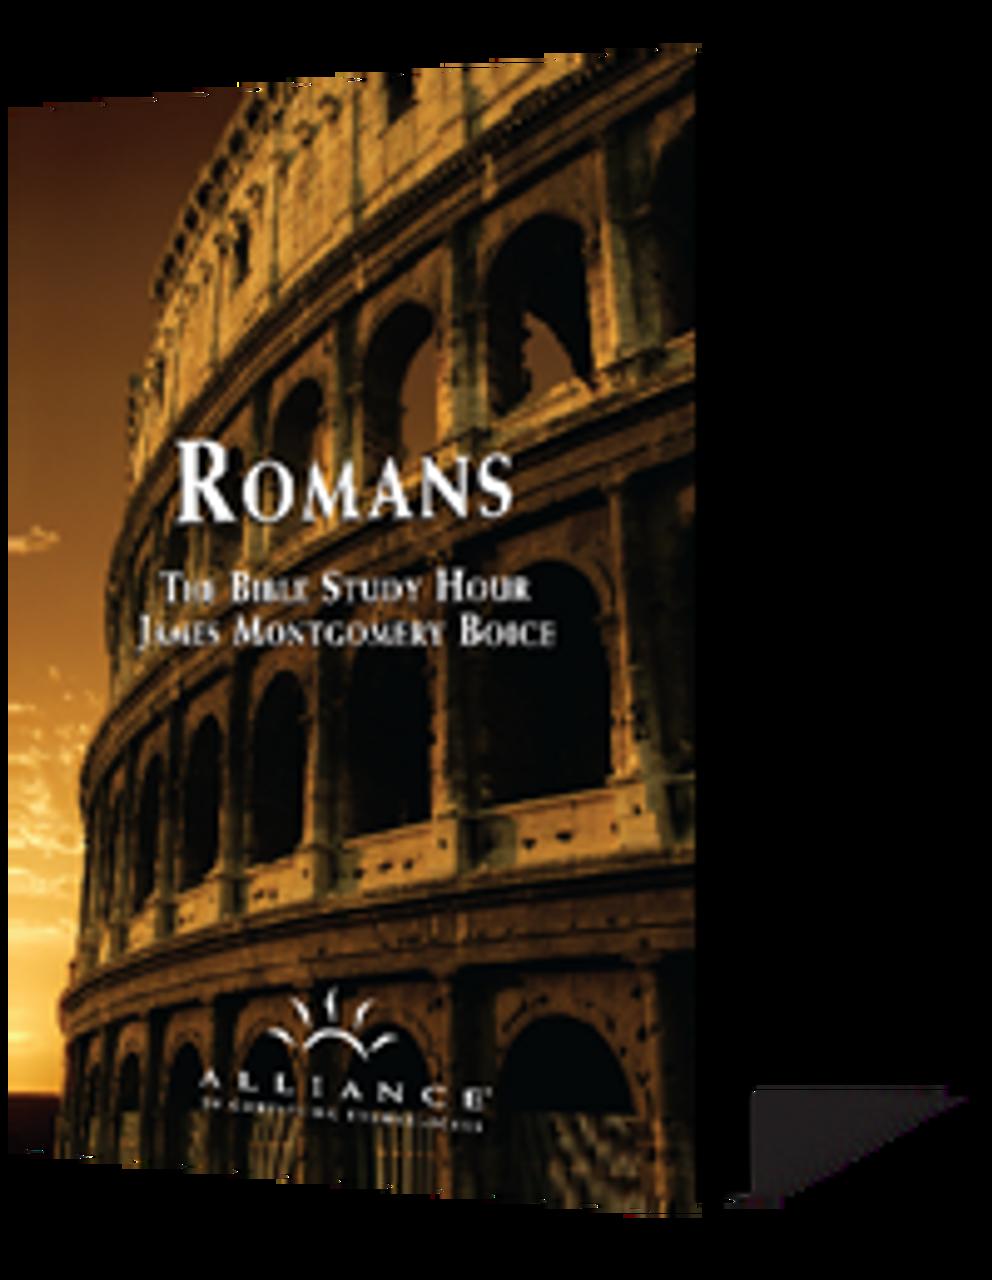 Romans, Volume 1: An Introduction (CD Set)